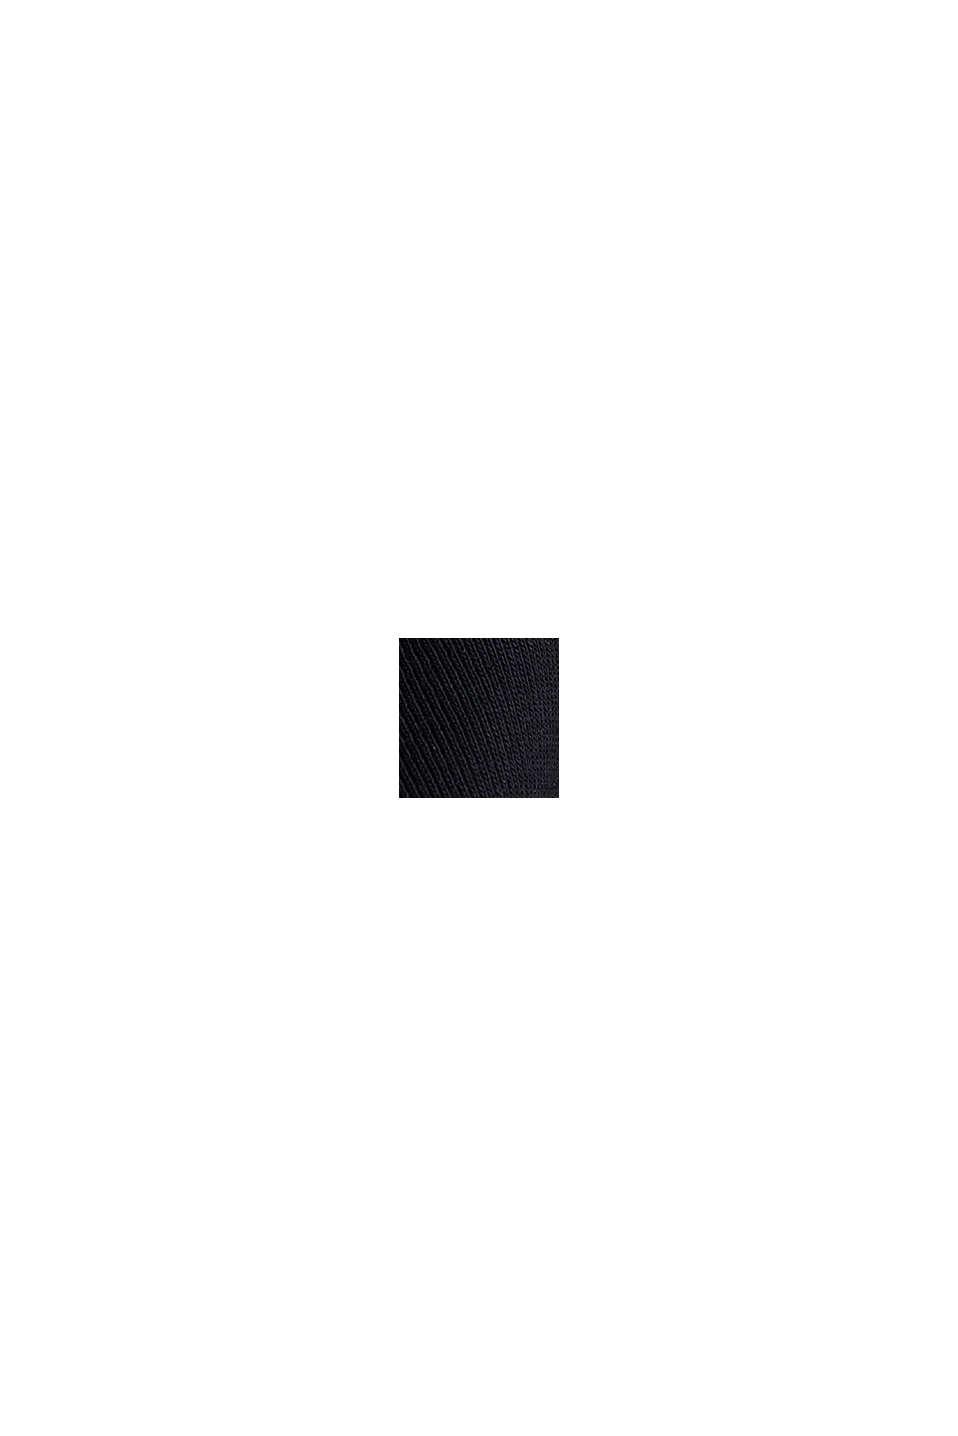 Tričko se stojáčkem, 100% bavlna, BLACK, swatch